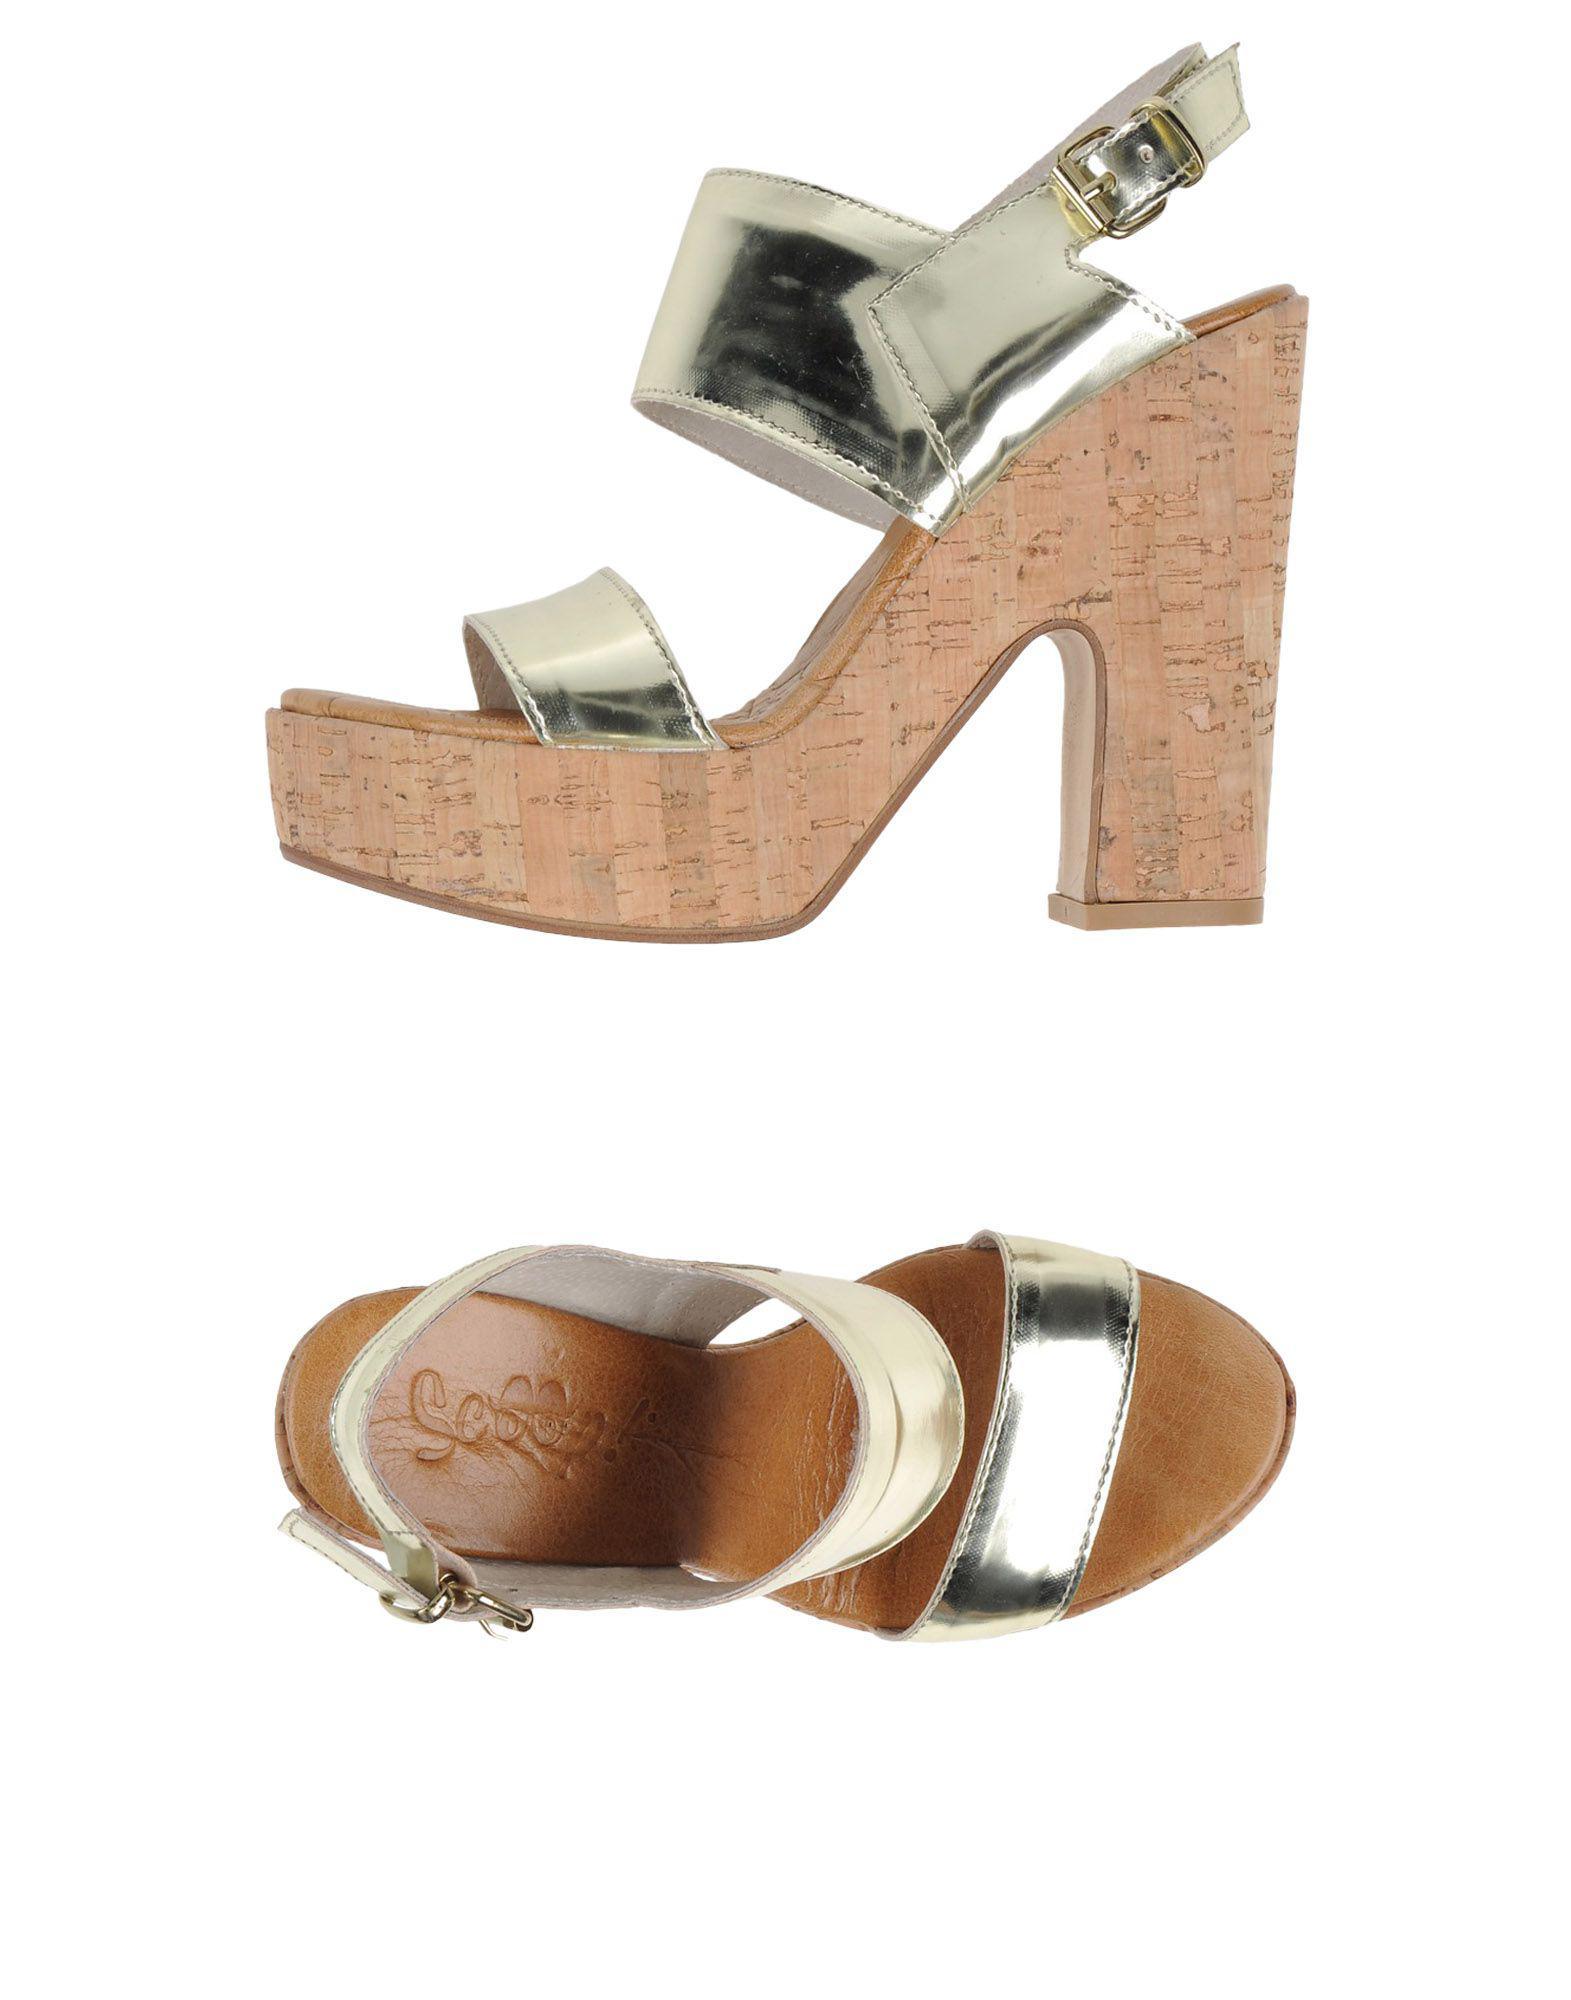 FOOTWEAR - Sandals Scoop! y8AiTbBCW